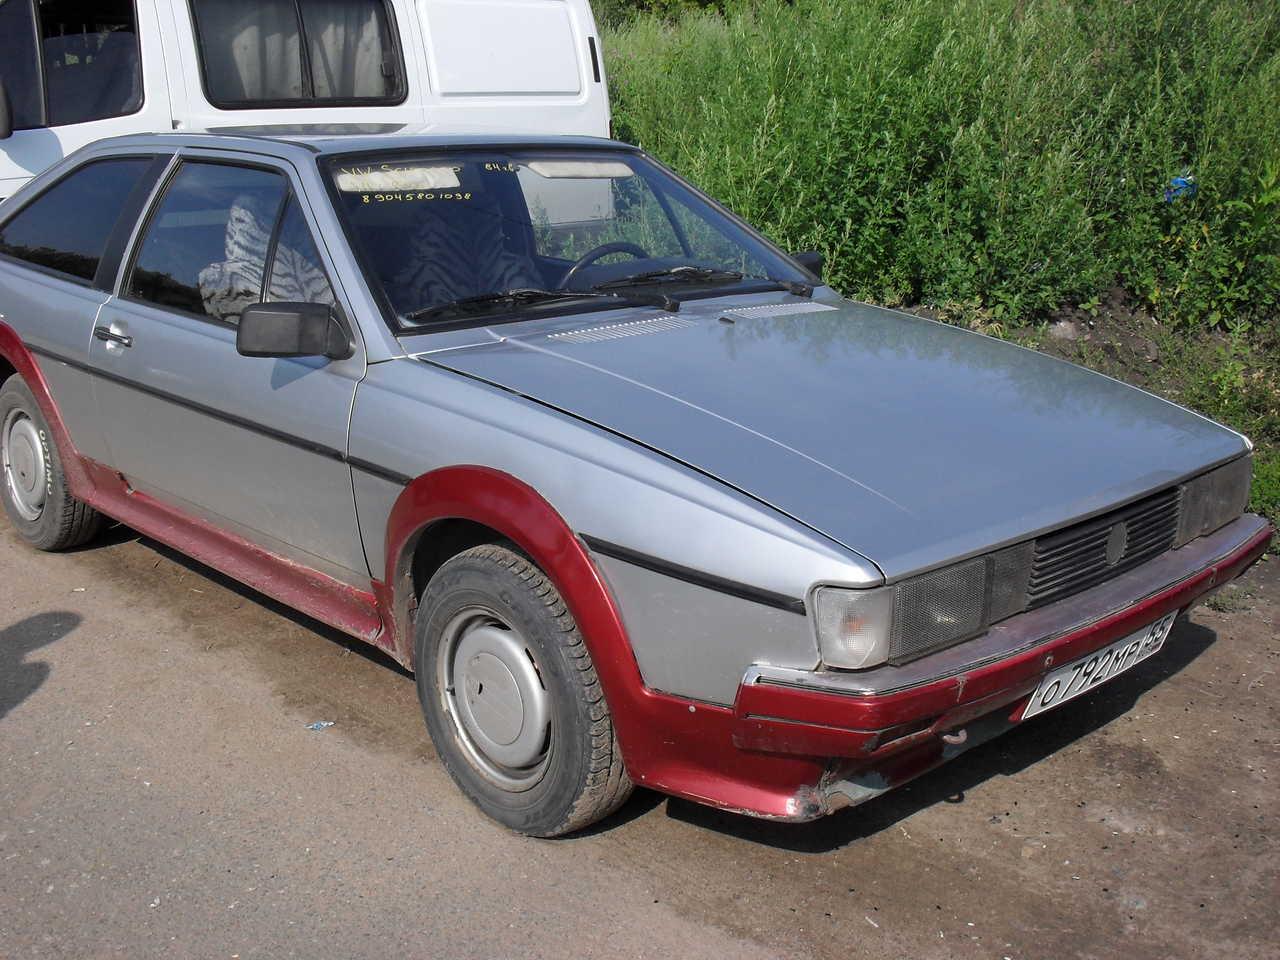 1984 Volkswagen Scirocco Pictures, 1800cc. For Sale